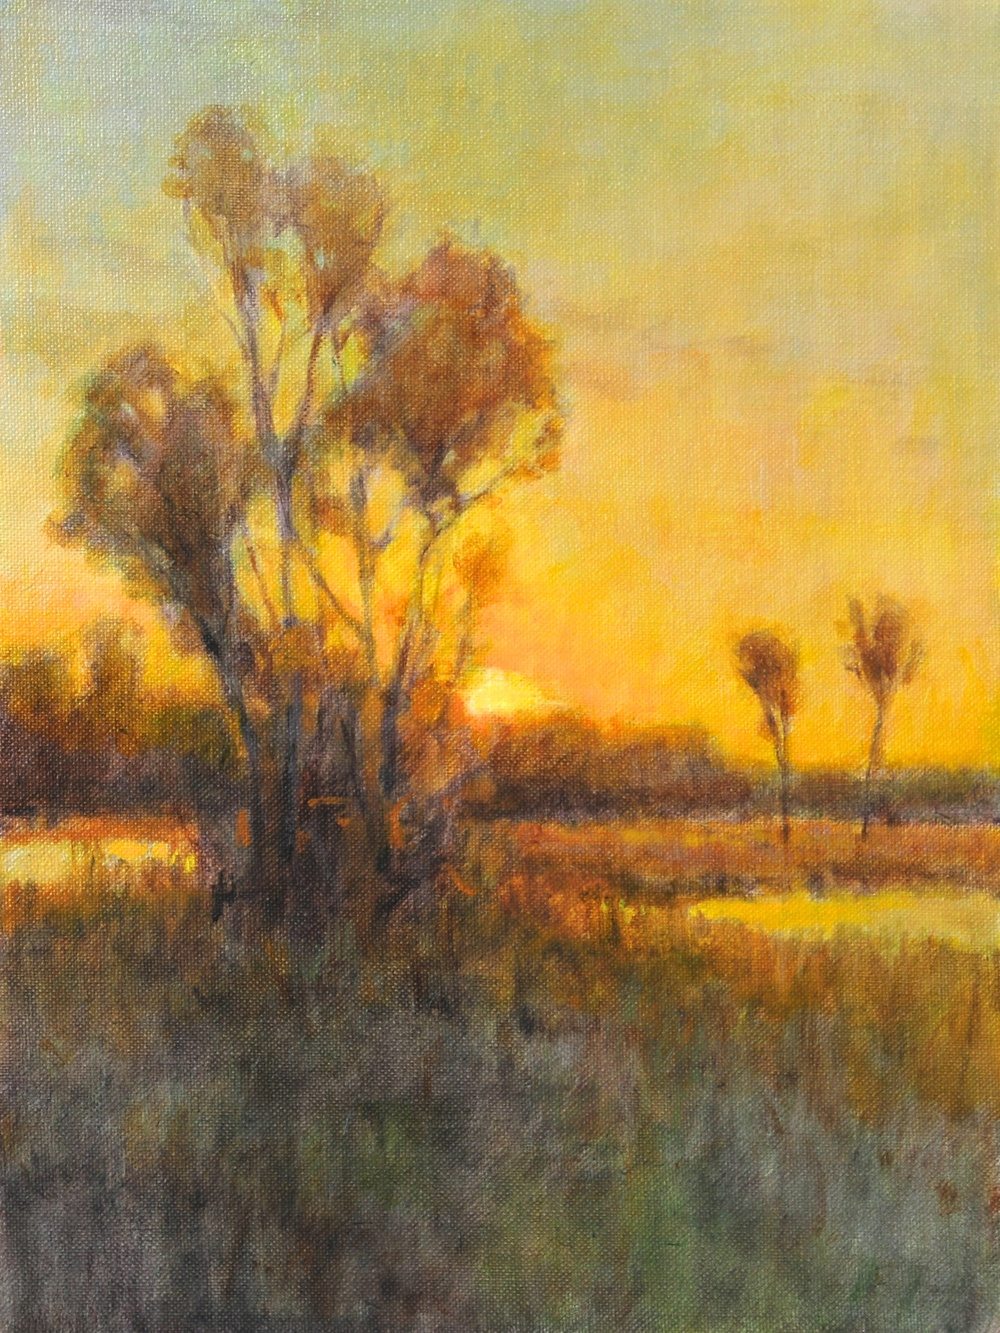 Sunset at Sandy Creek. 9 x 12. Oil on linen panel.